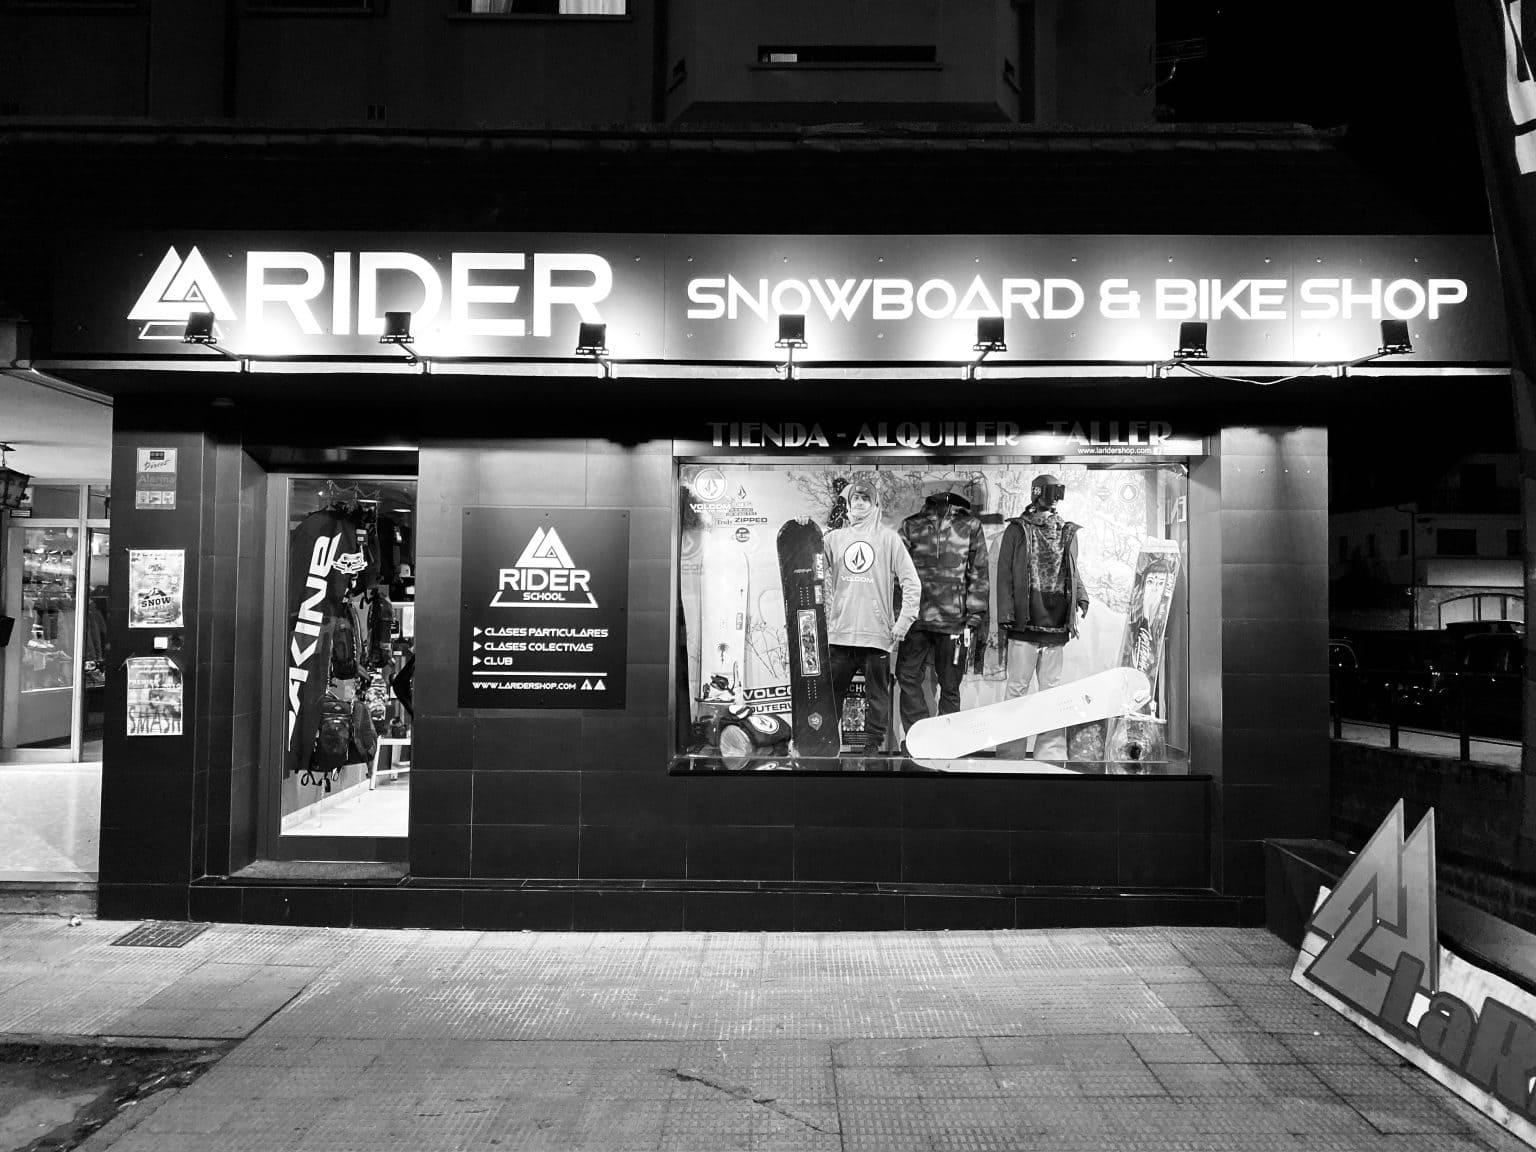 larider bike tienda vielha